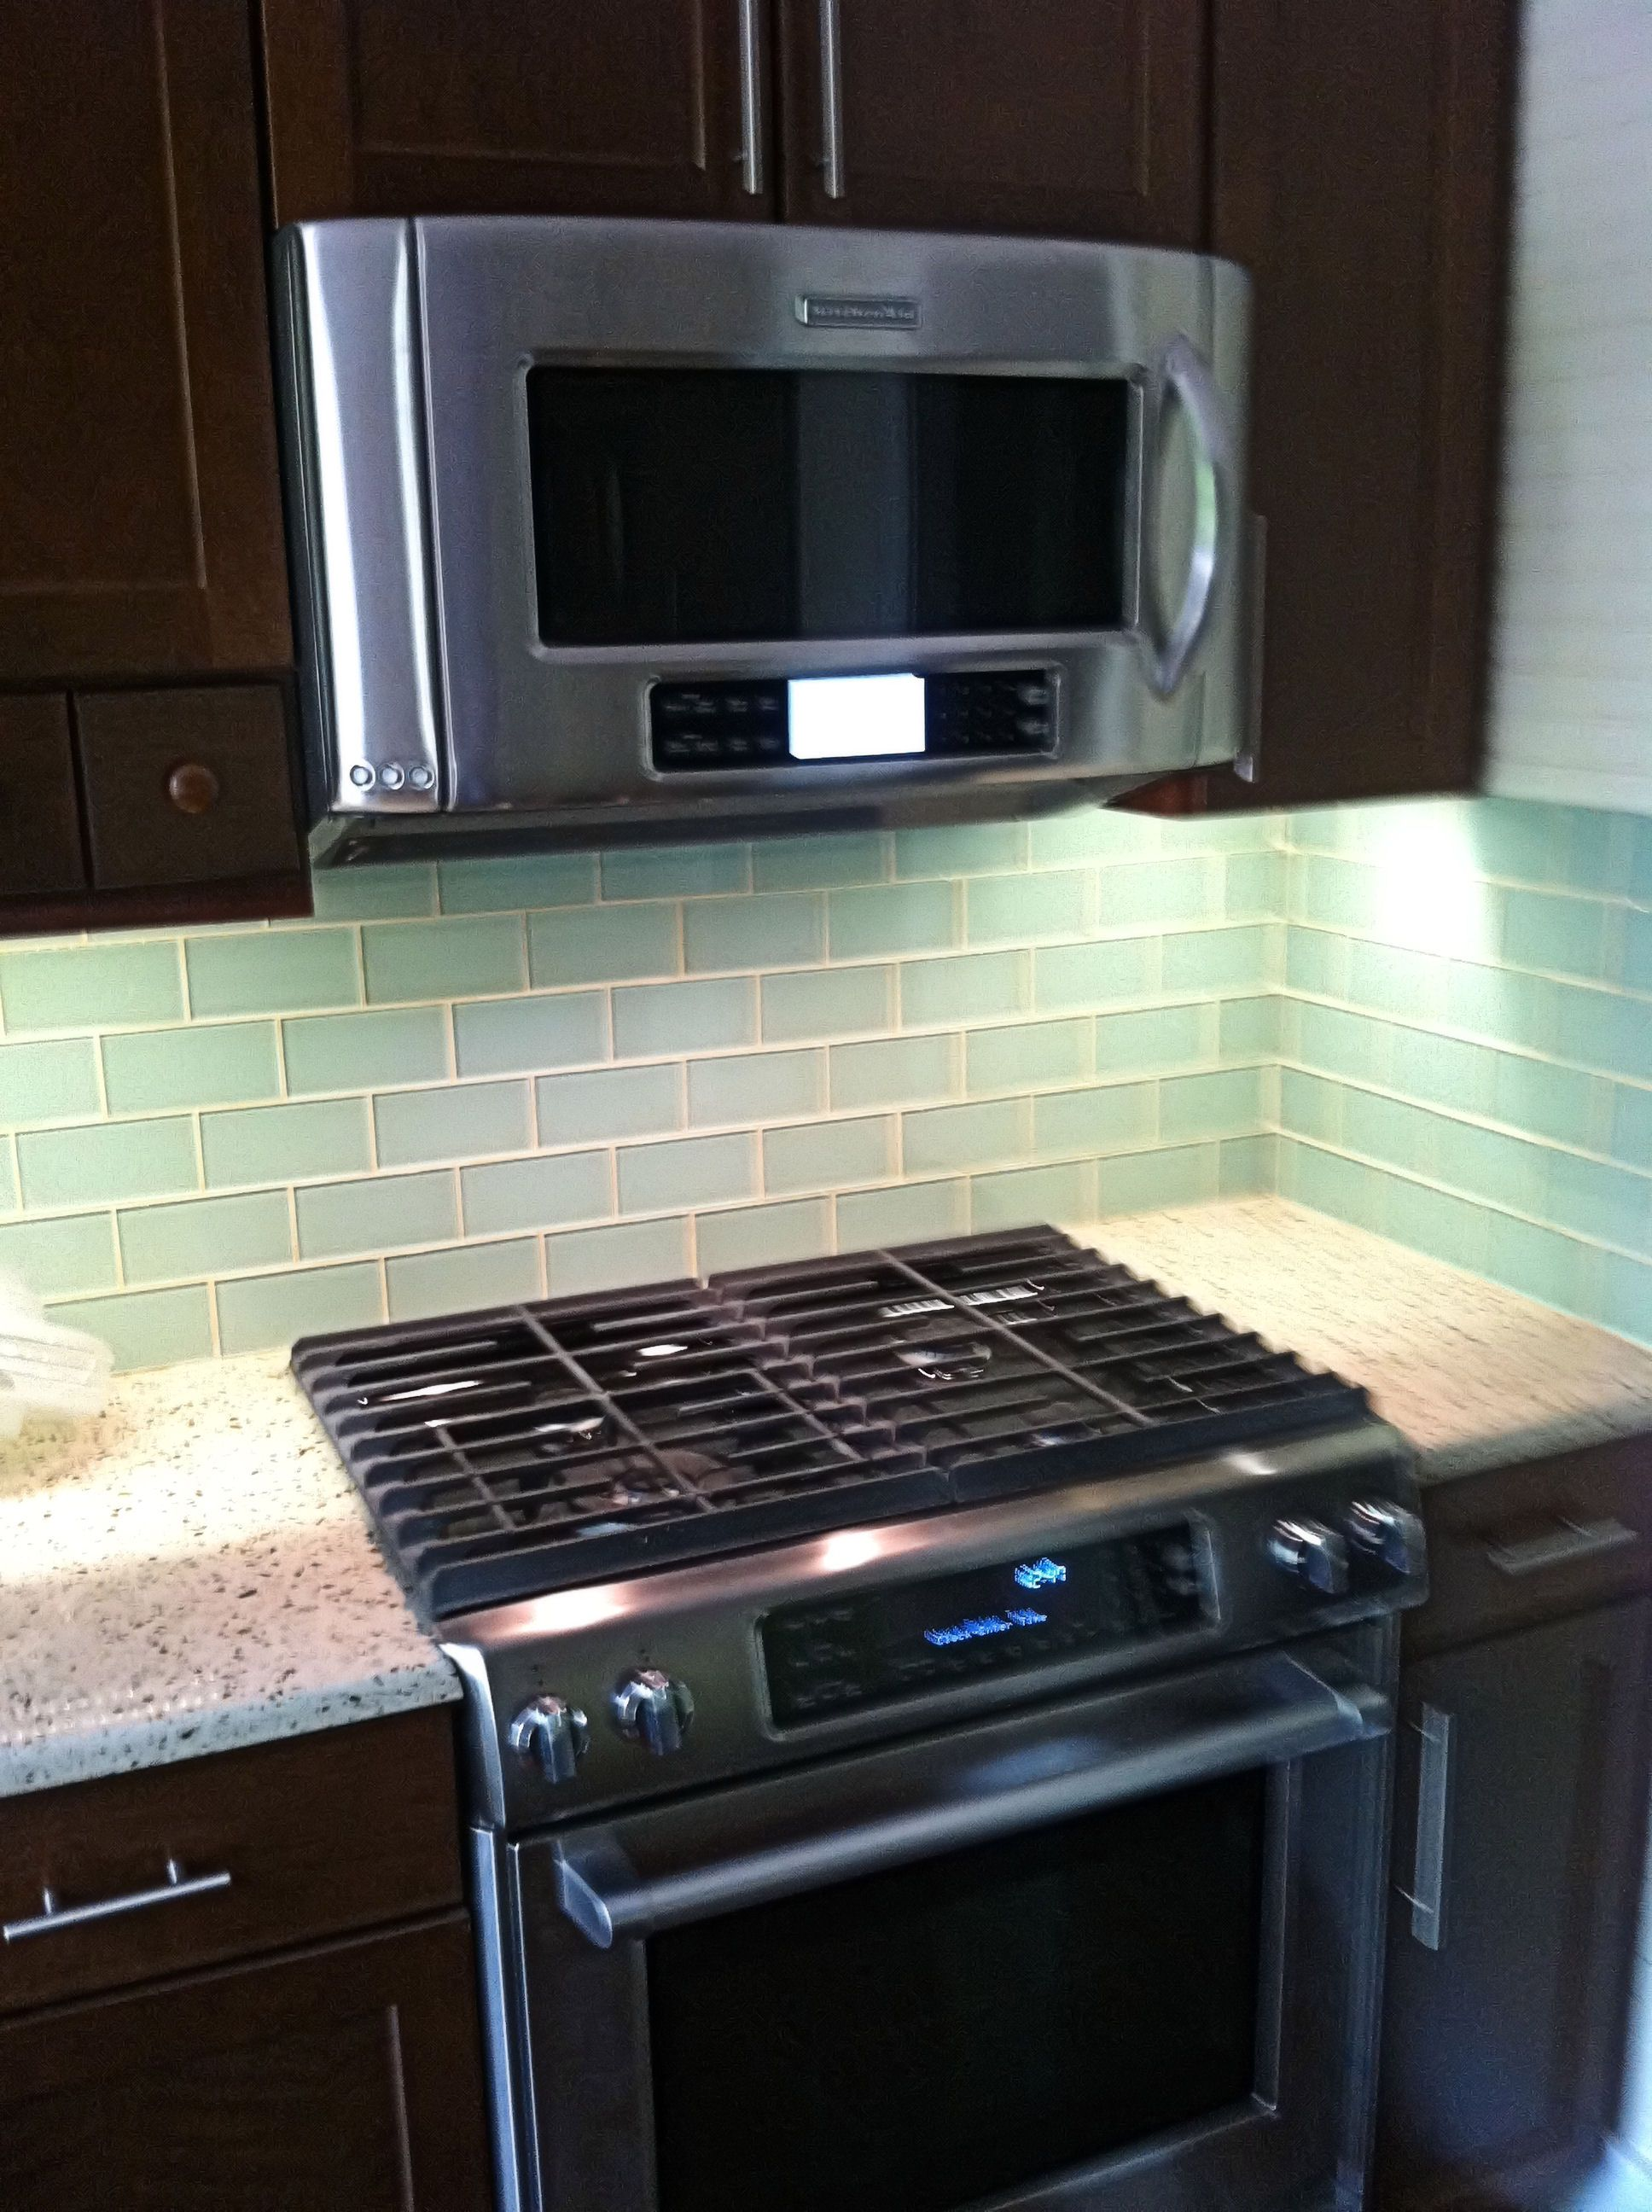 Subway Tile Kitchen: Subway Tiles, Kitchen Backsplash